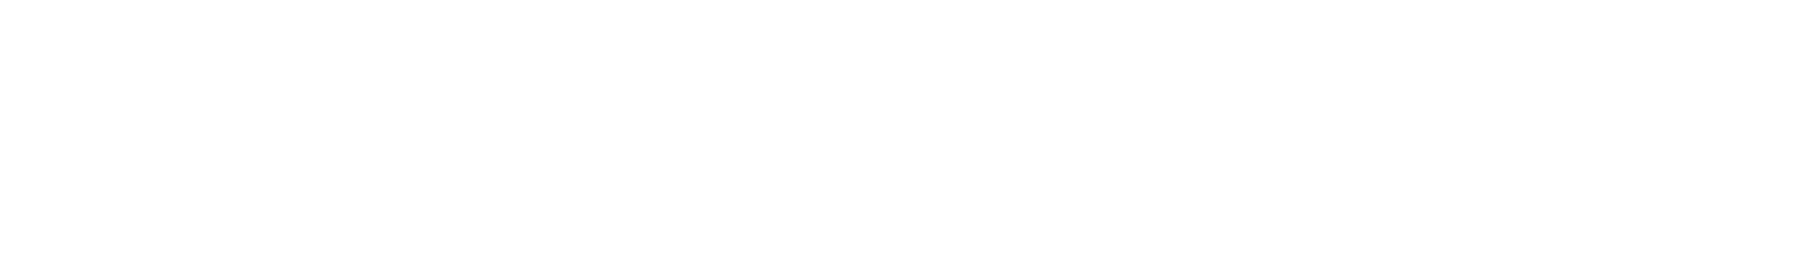 alvinbary 16